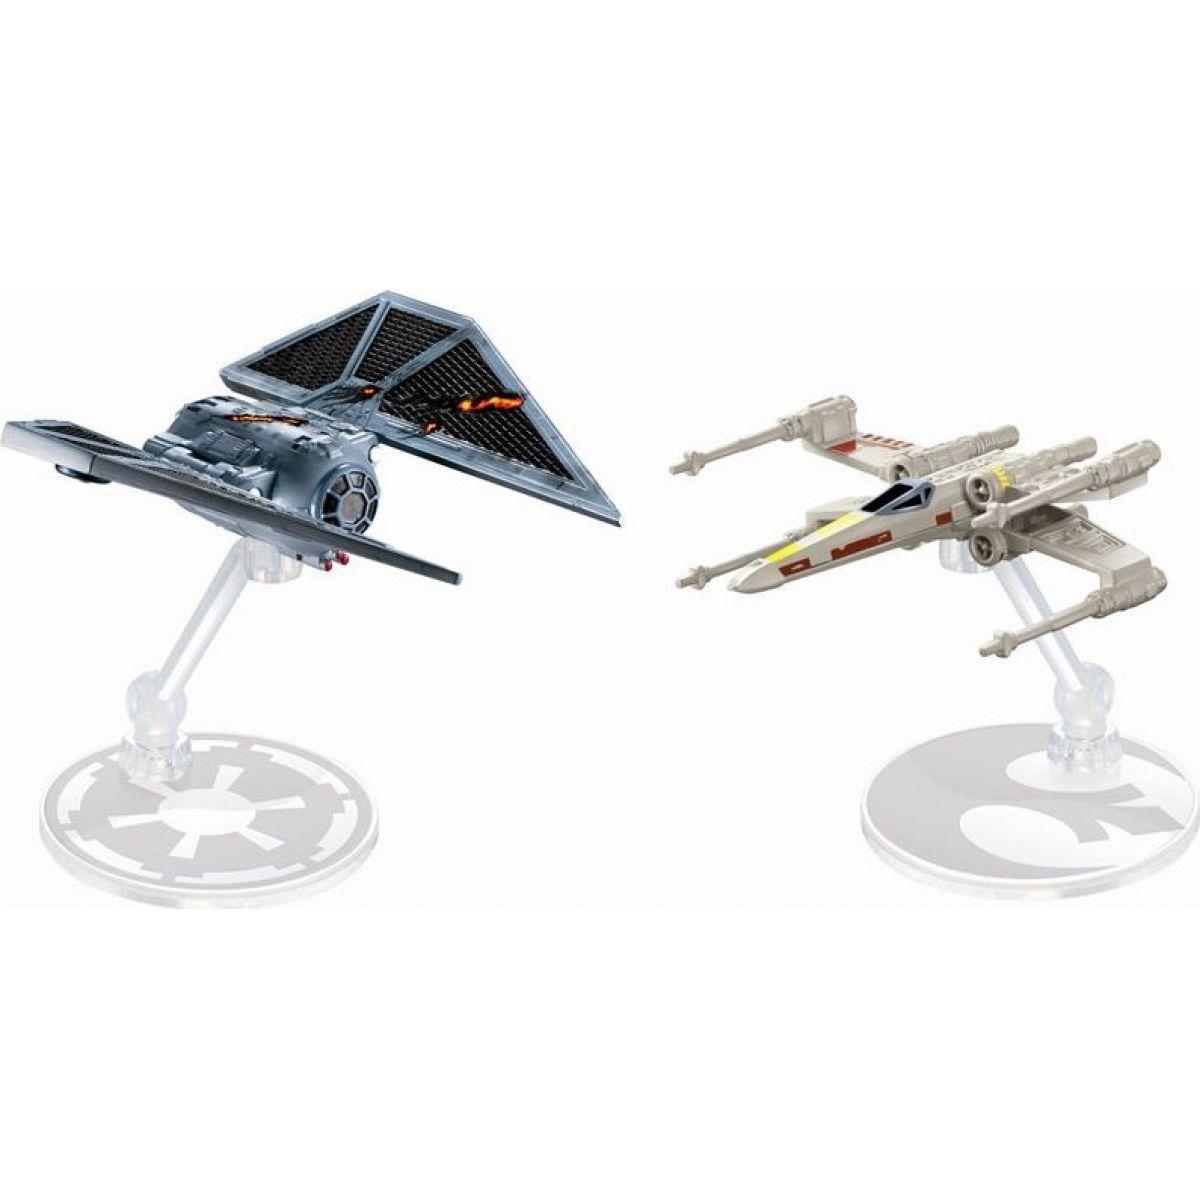 Hot Wheels Star Wars Starship - Tie Striker vs. X-Wing Fighter DXM38